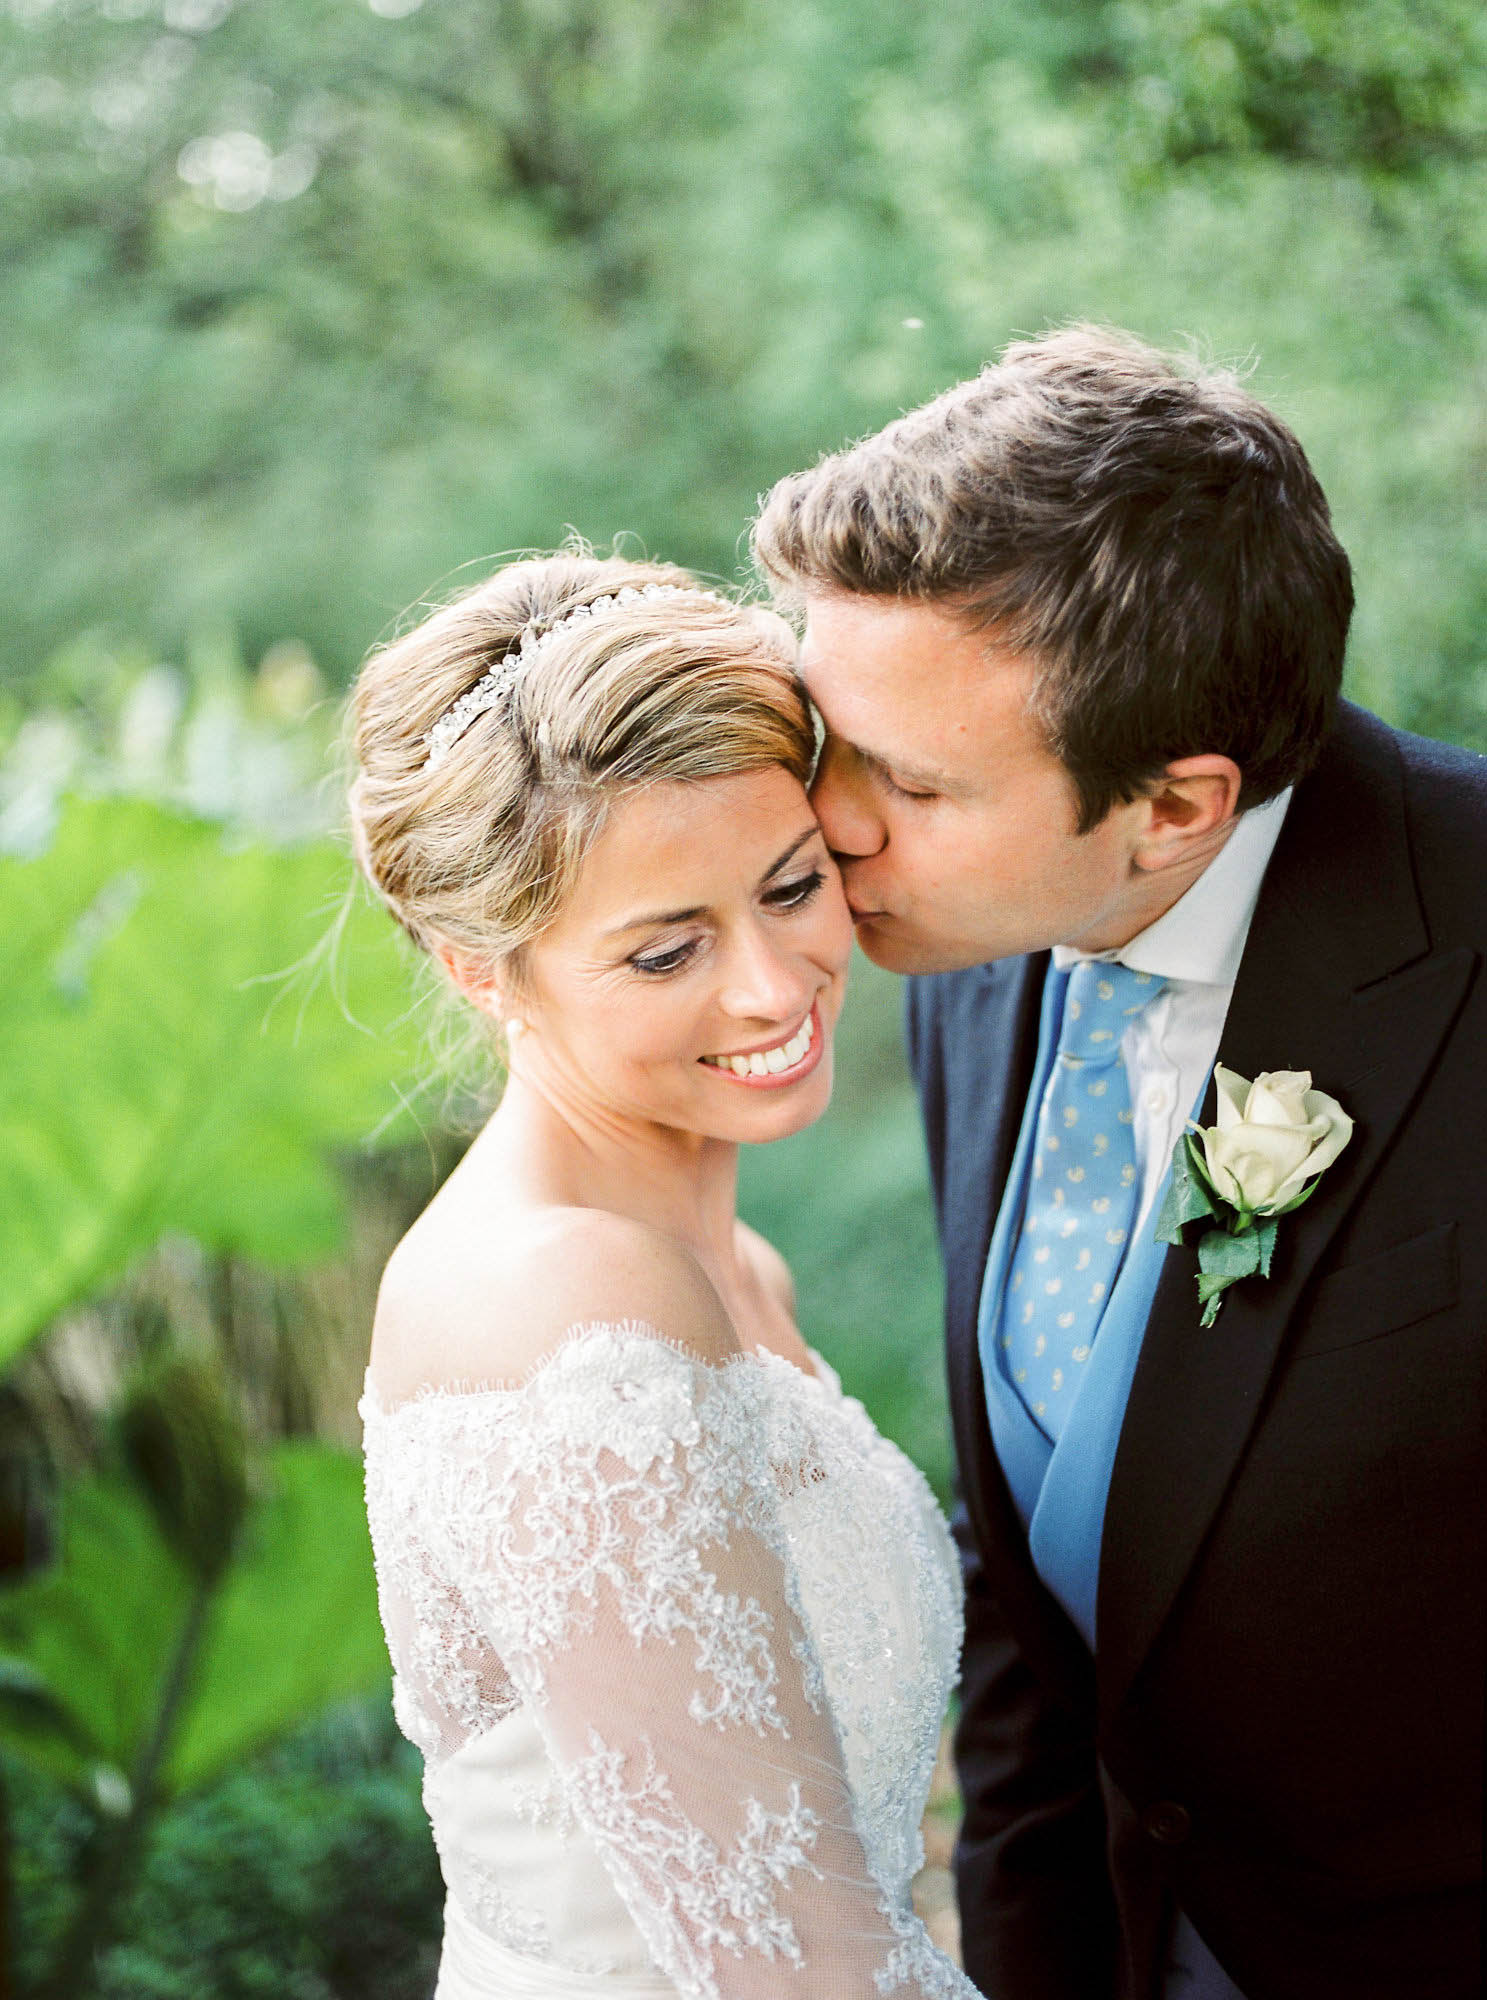 Amy O'Boyle Photography- Destination & UK Fine Art Film Wedding Photographer- English Countryside Wedding-19.jpg